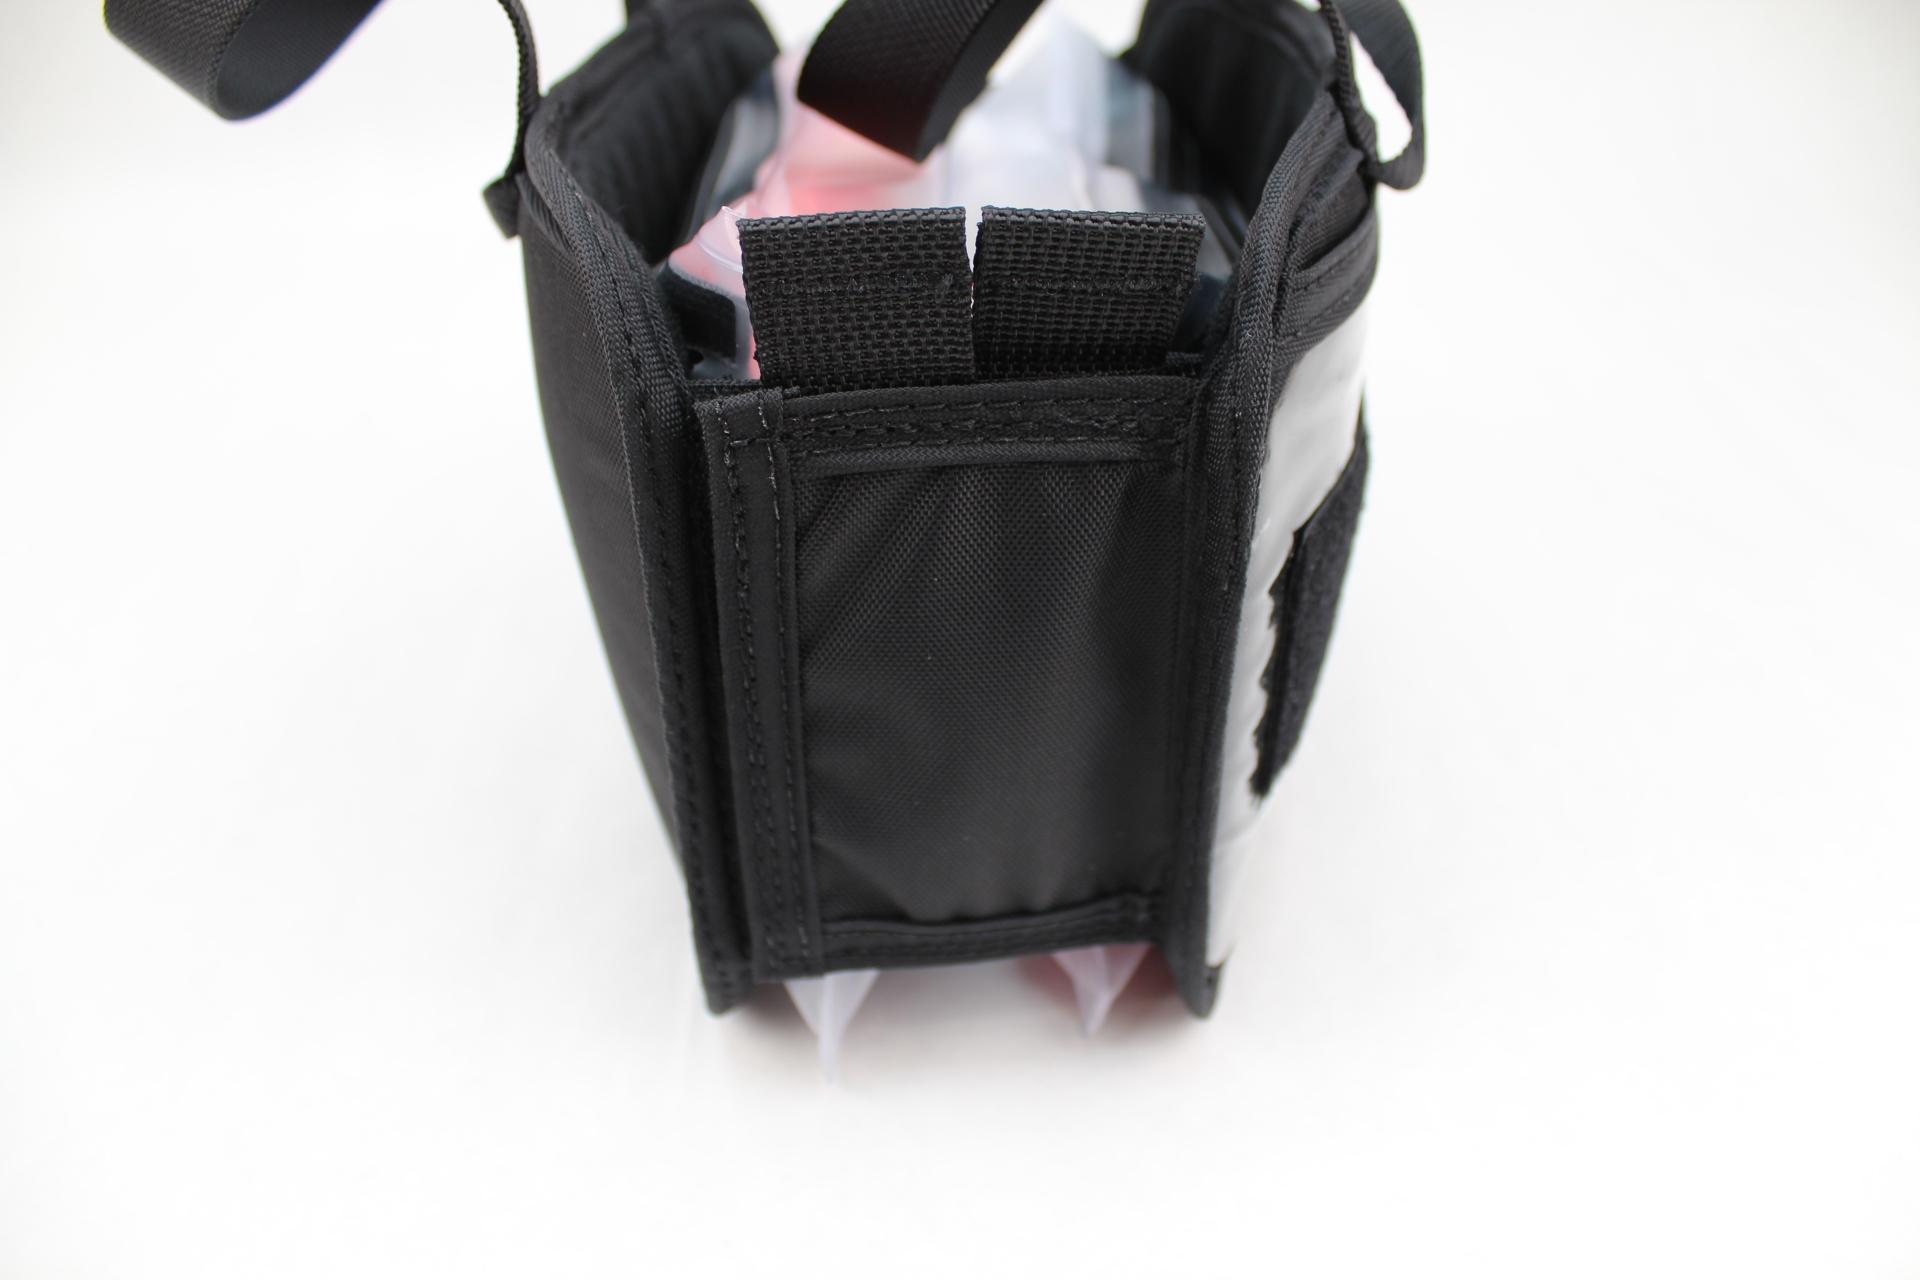 Small Tactical DASH bag binding side view